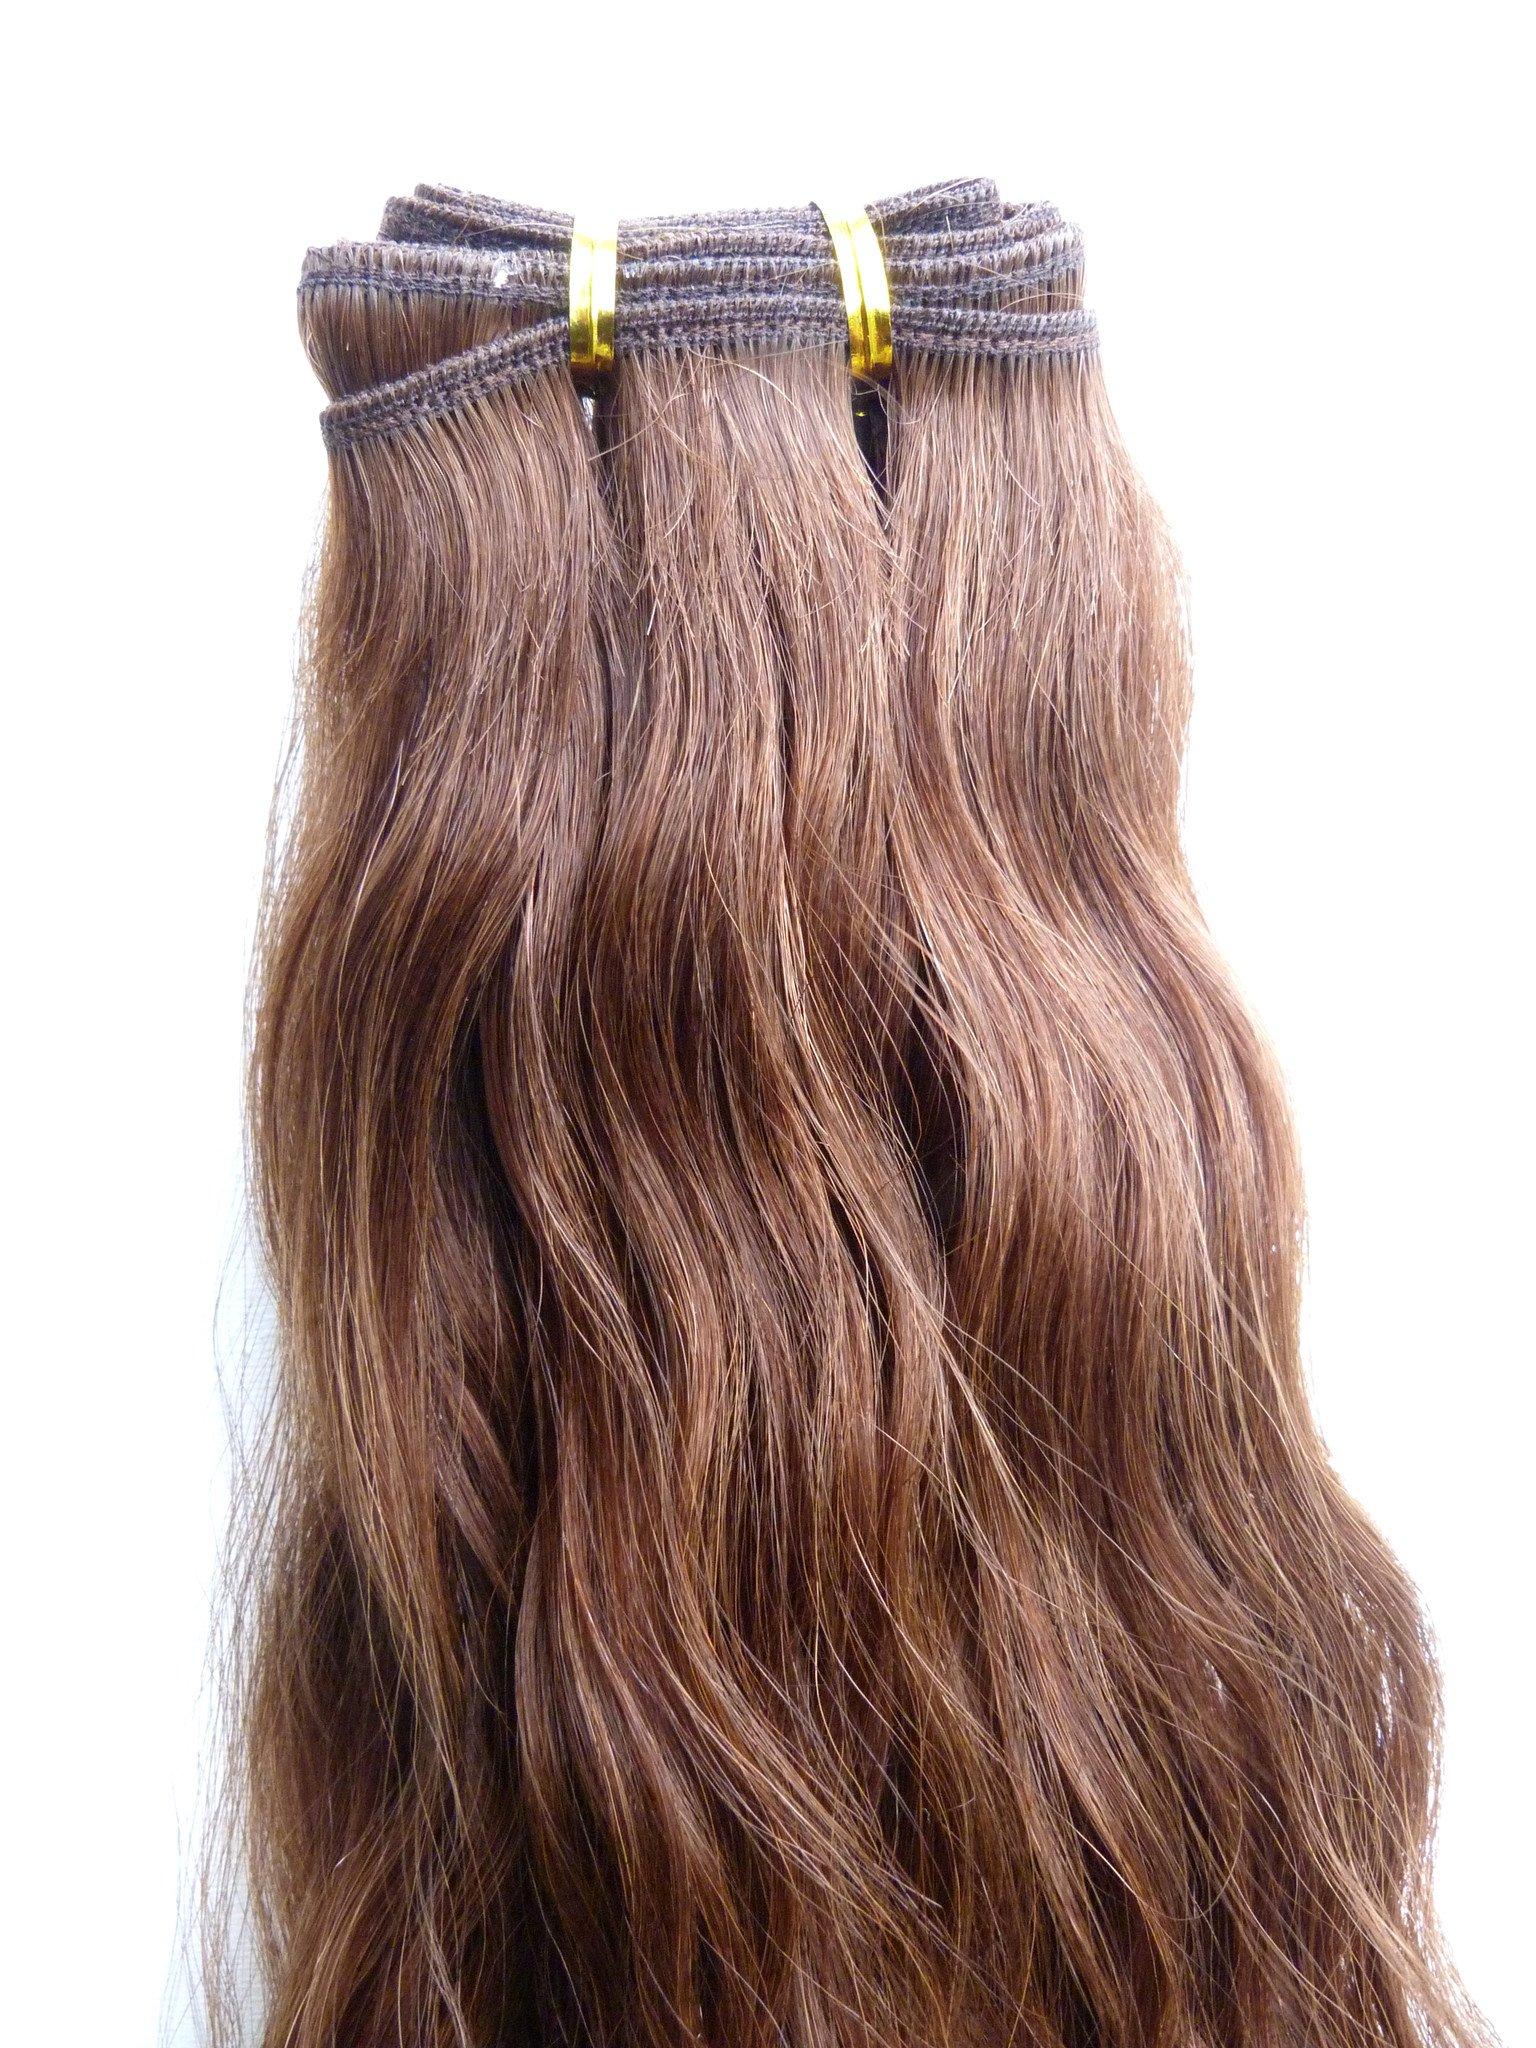 Chokladbrun löshår på trens europeiskt hår